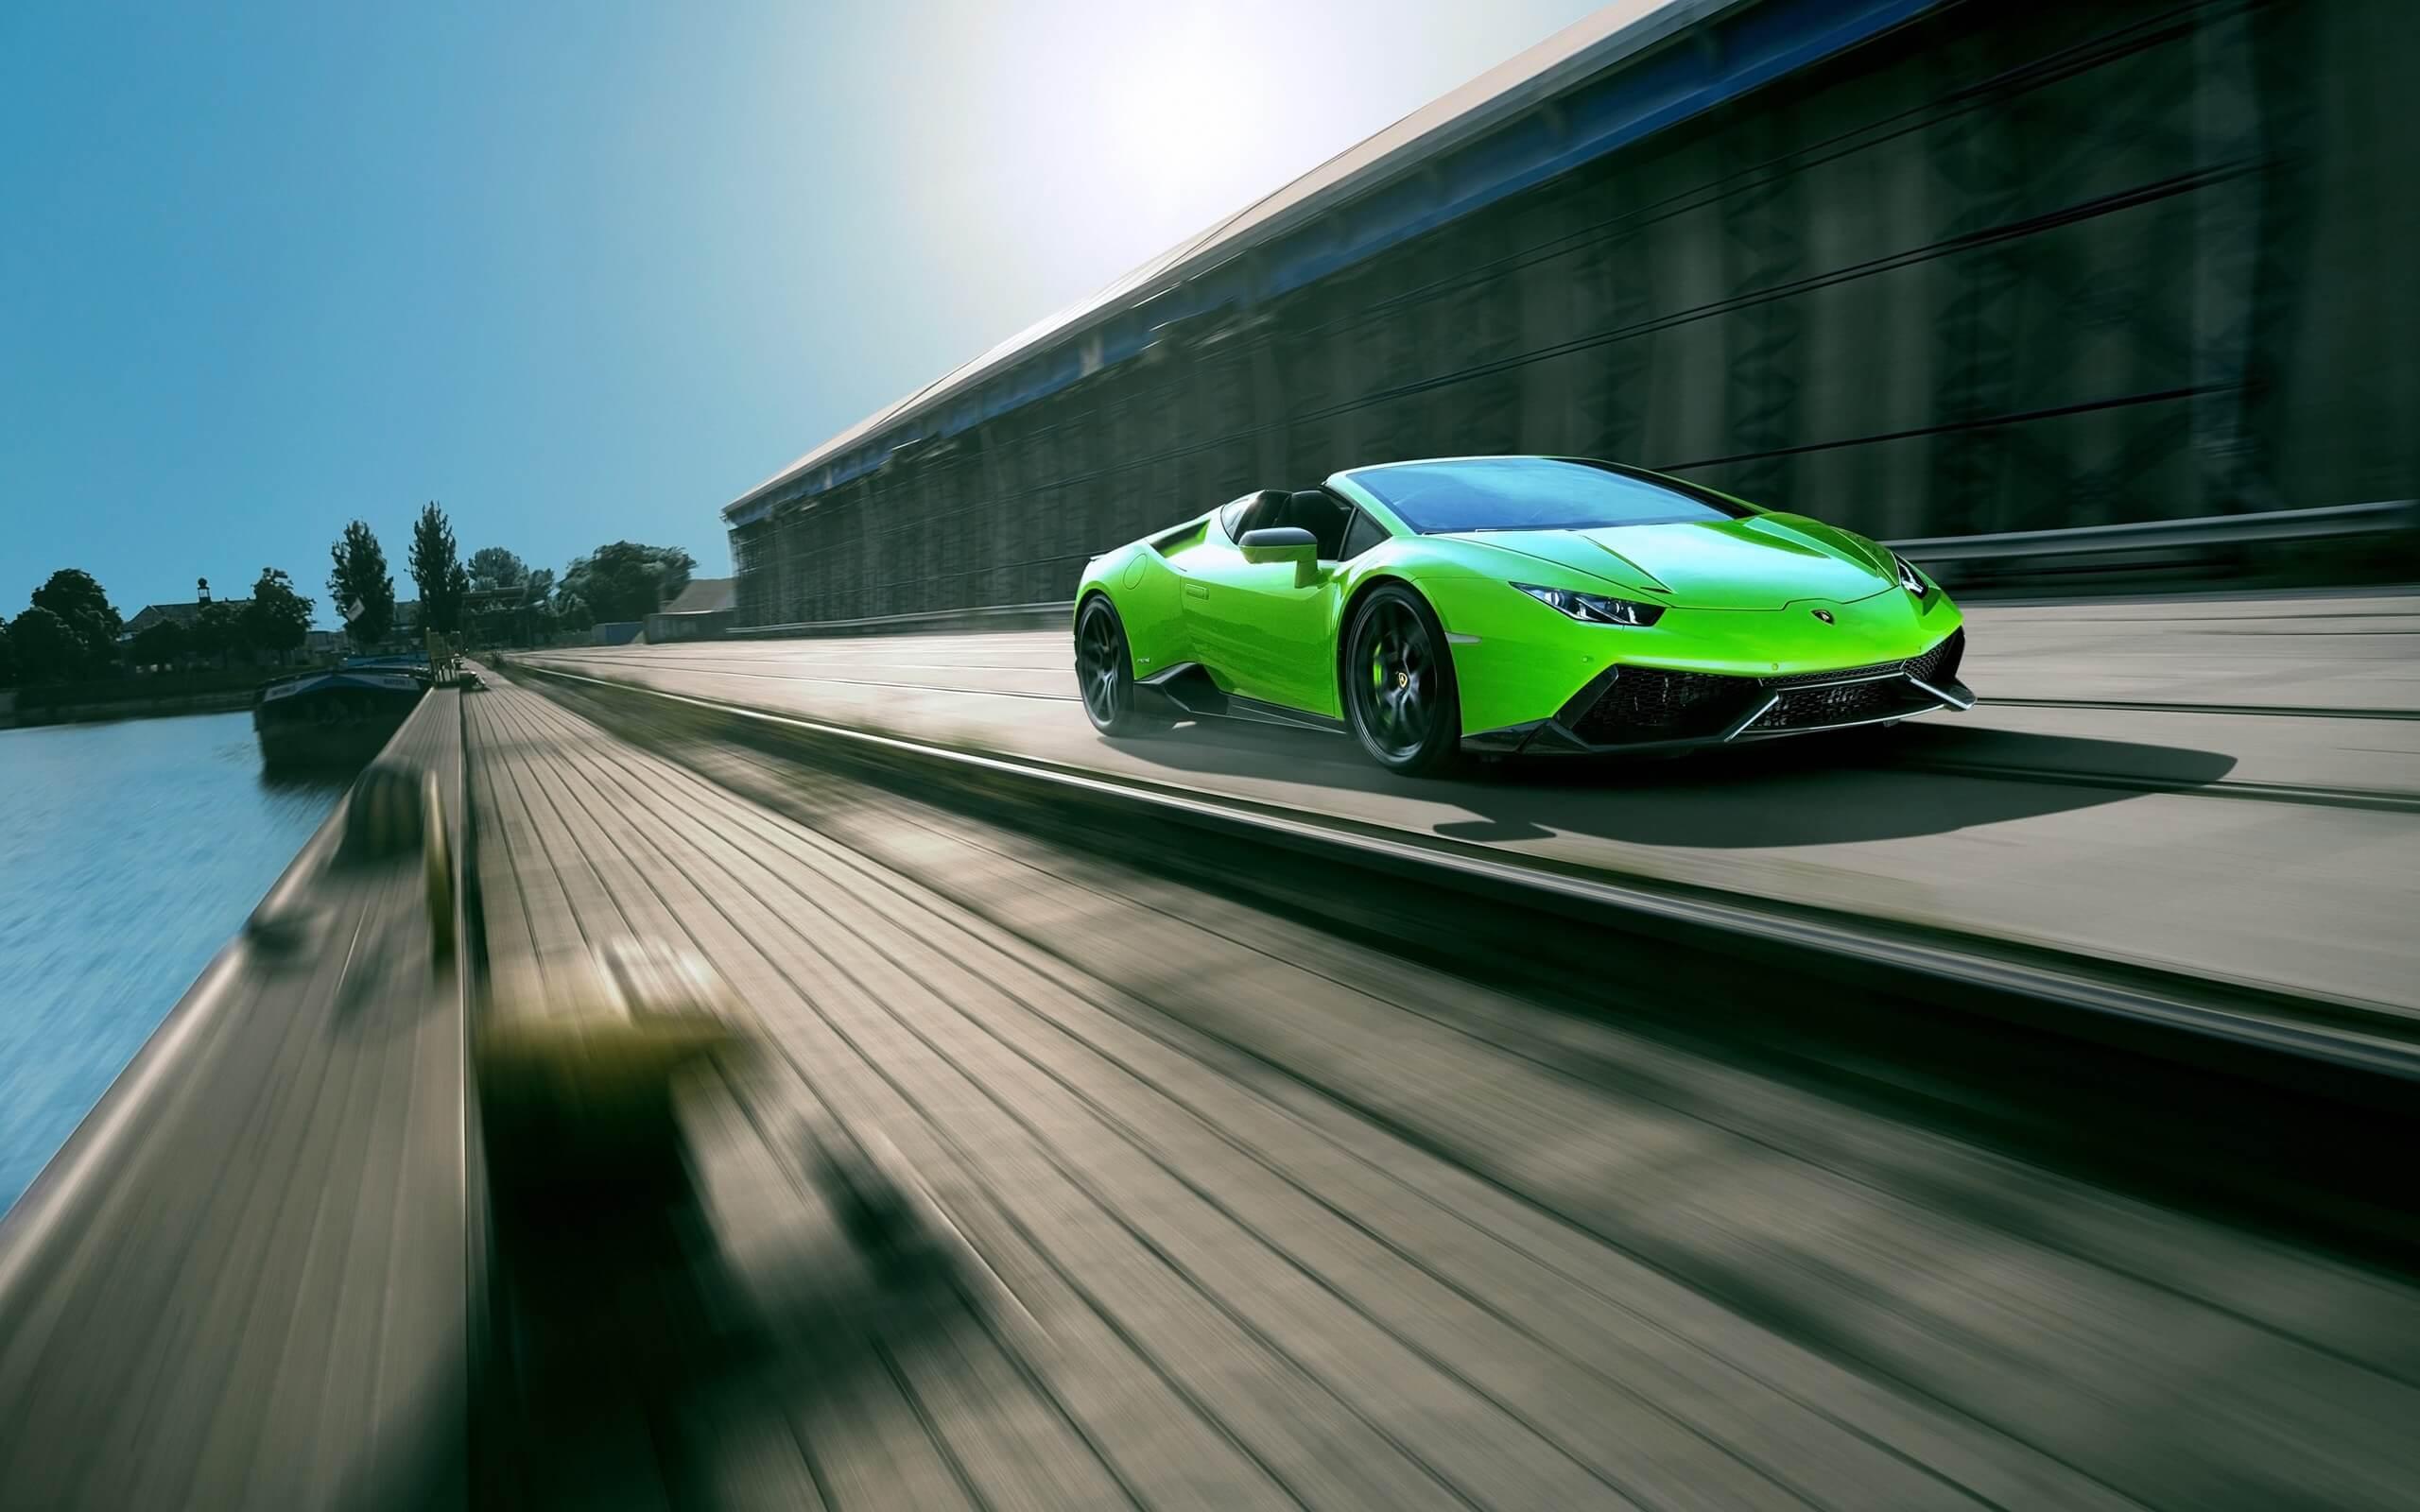 Novitec-Torado-Lamborghini-Huracan-Spyder-lamborghini-novitec-huracan-wallpaper-wp5209864